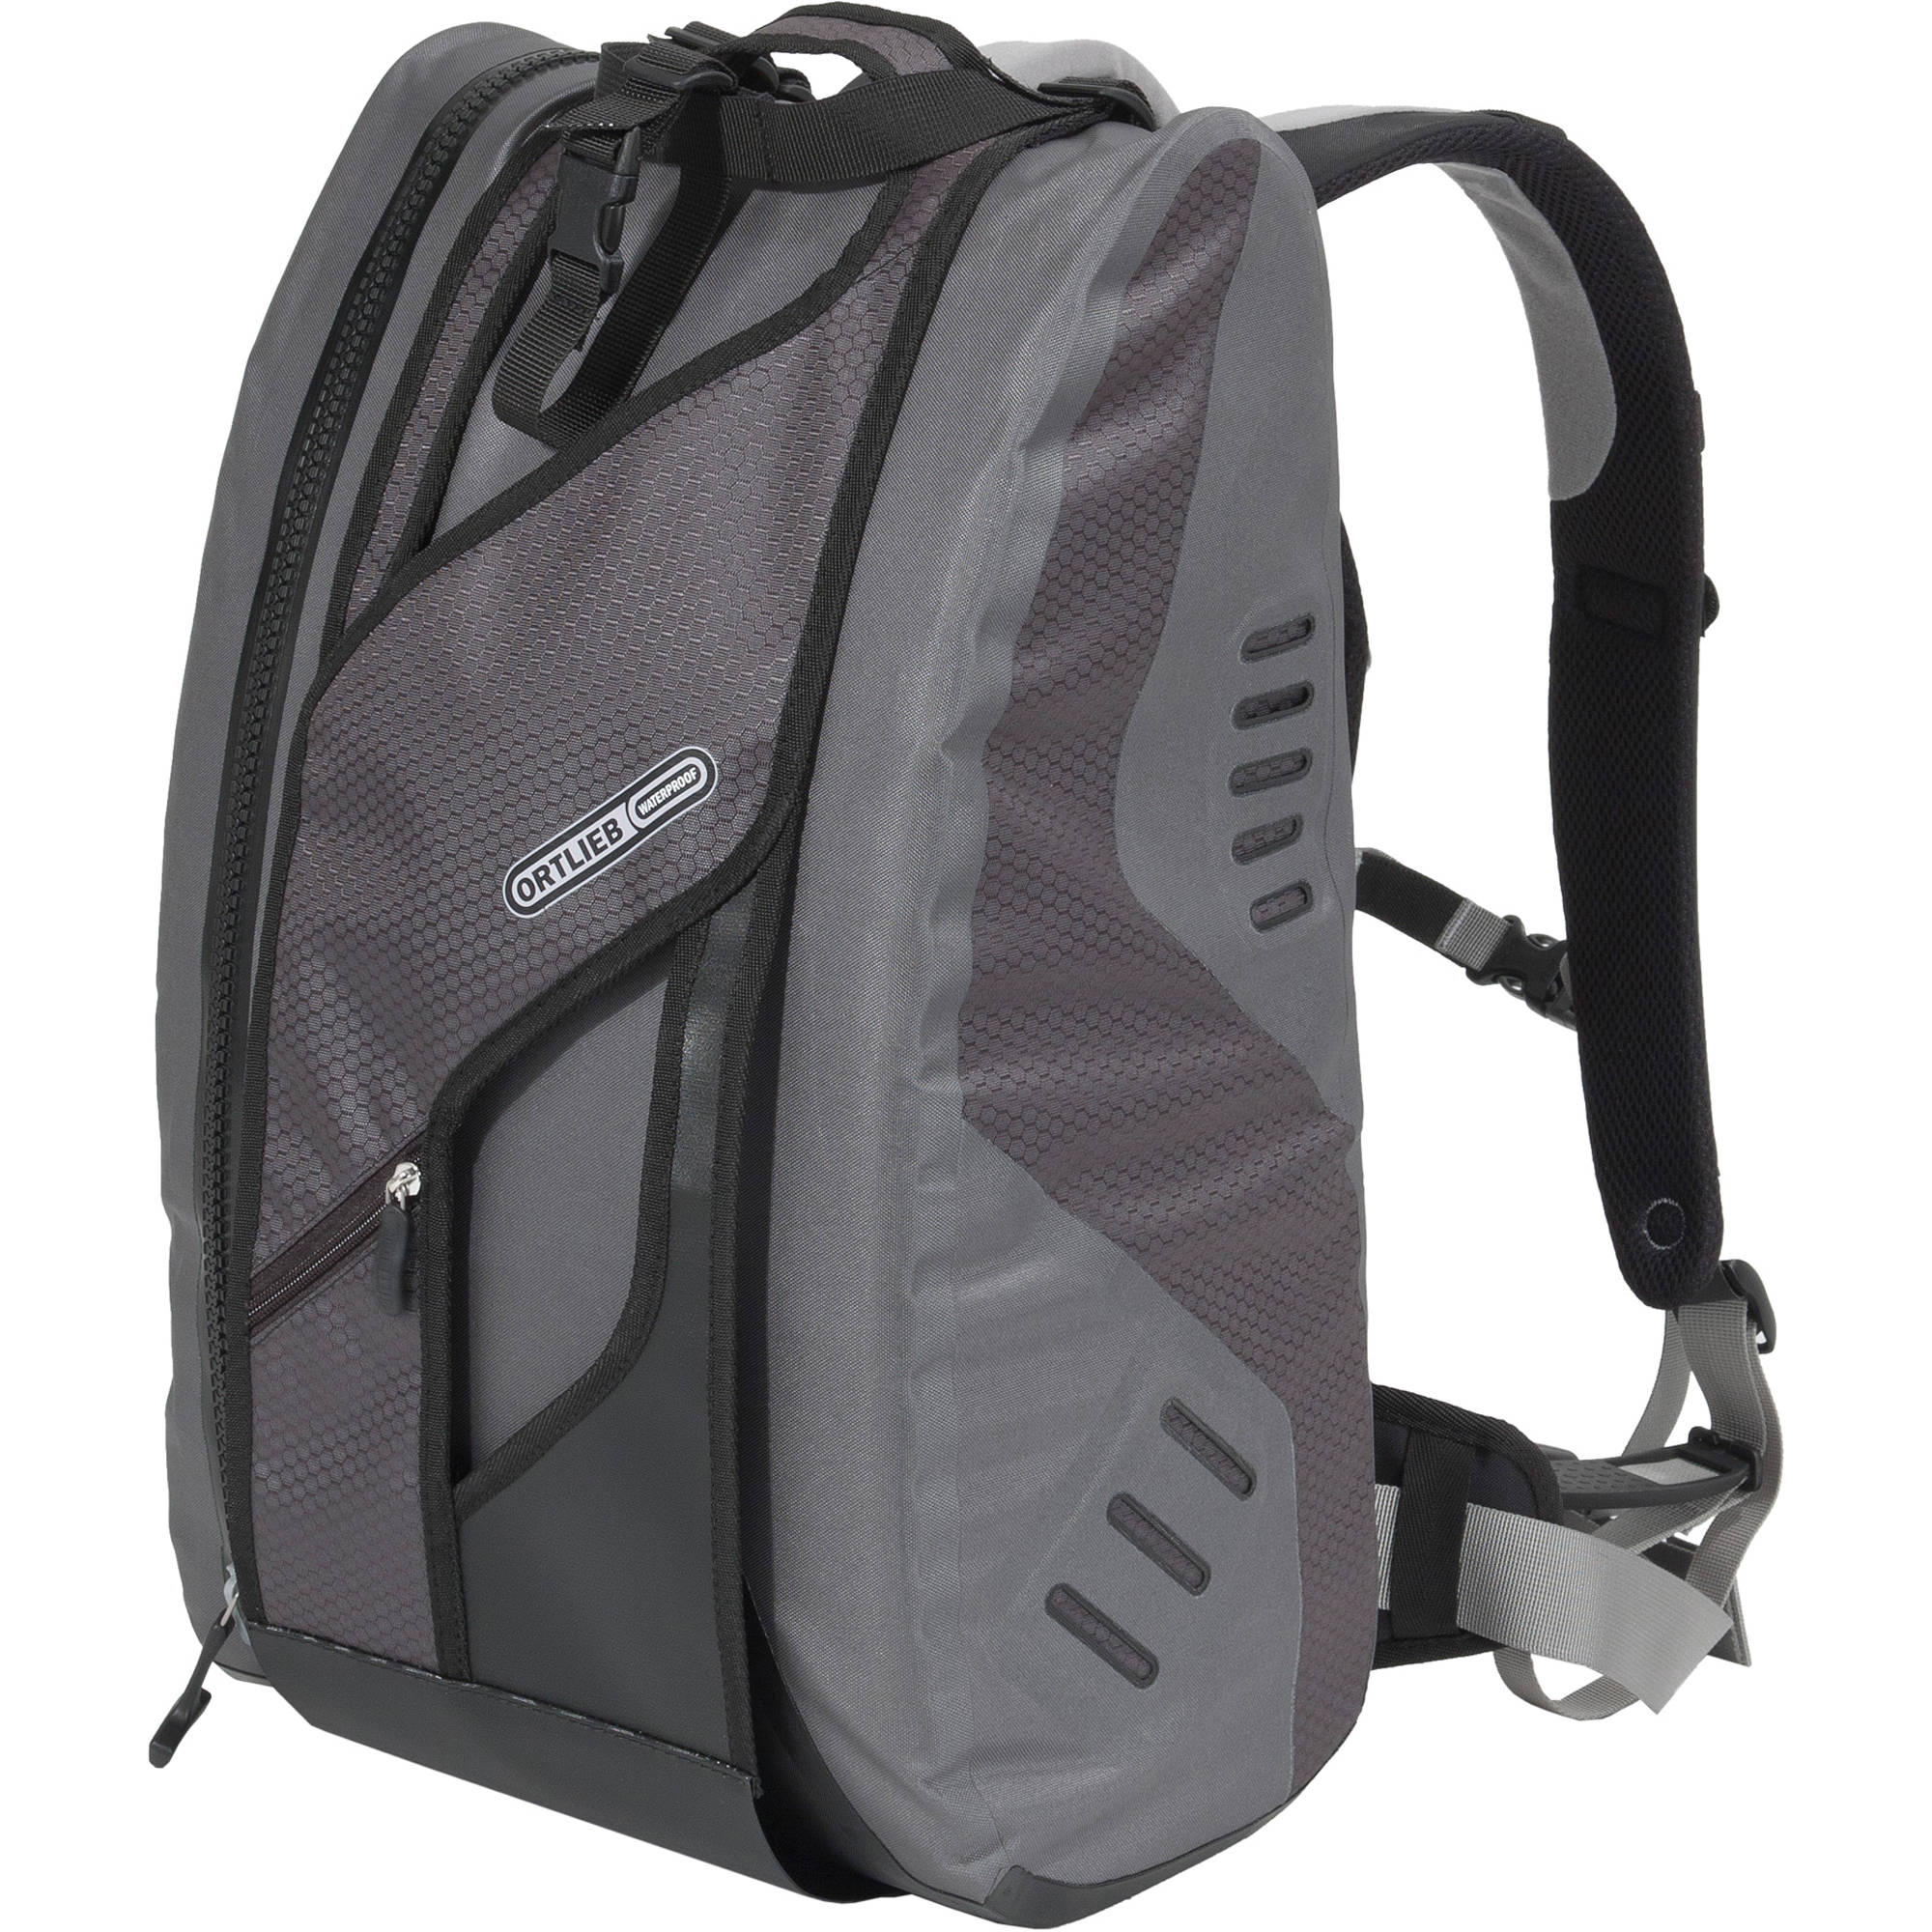 Ortlieb Day-Shot Camera Backpack P9651 B H Photo Video